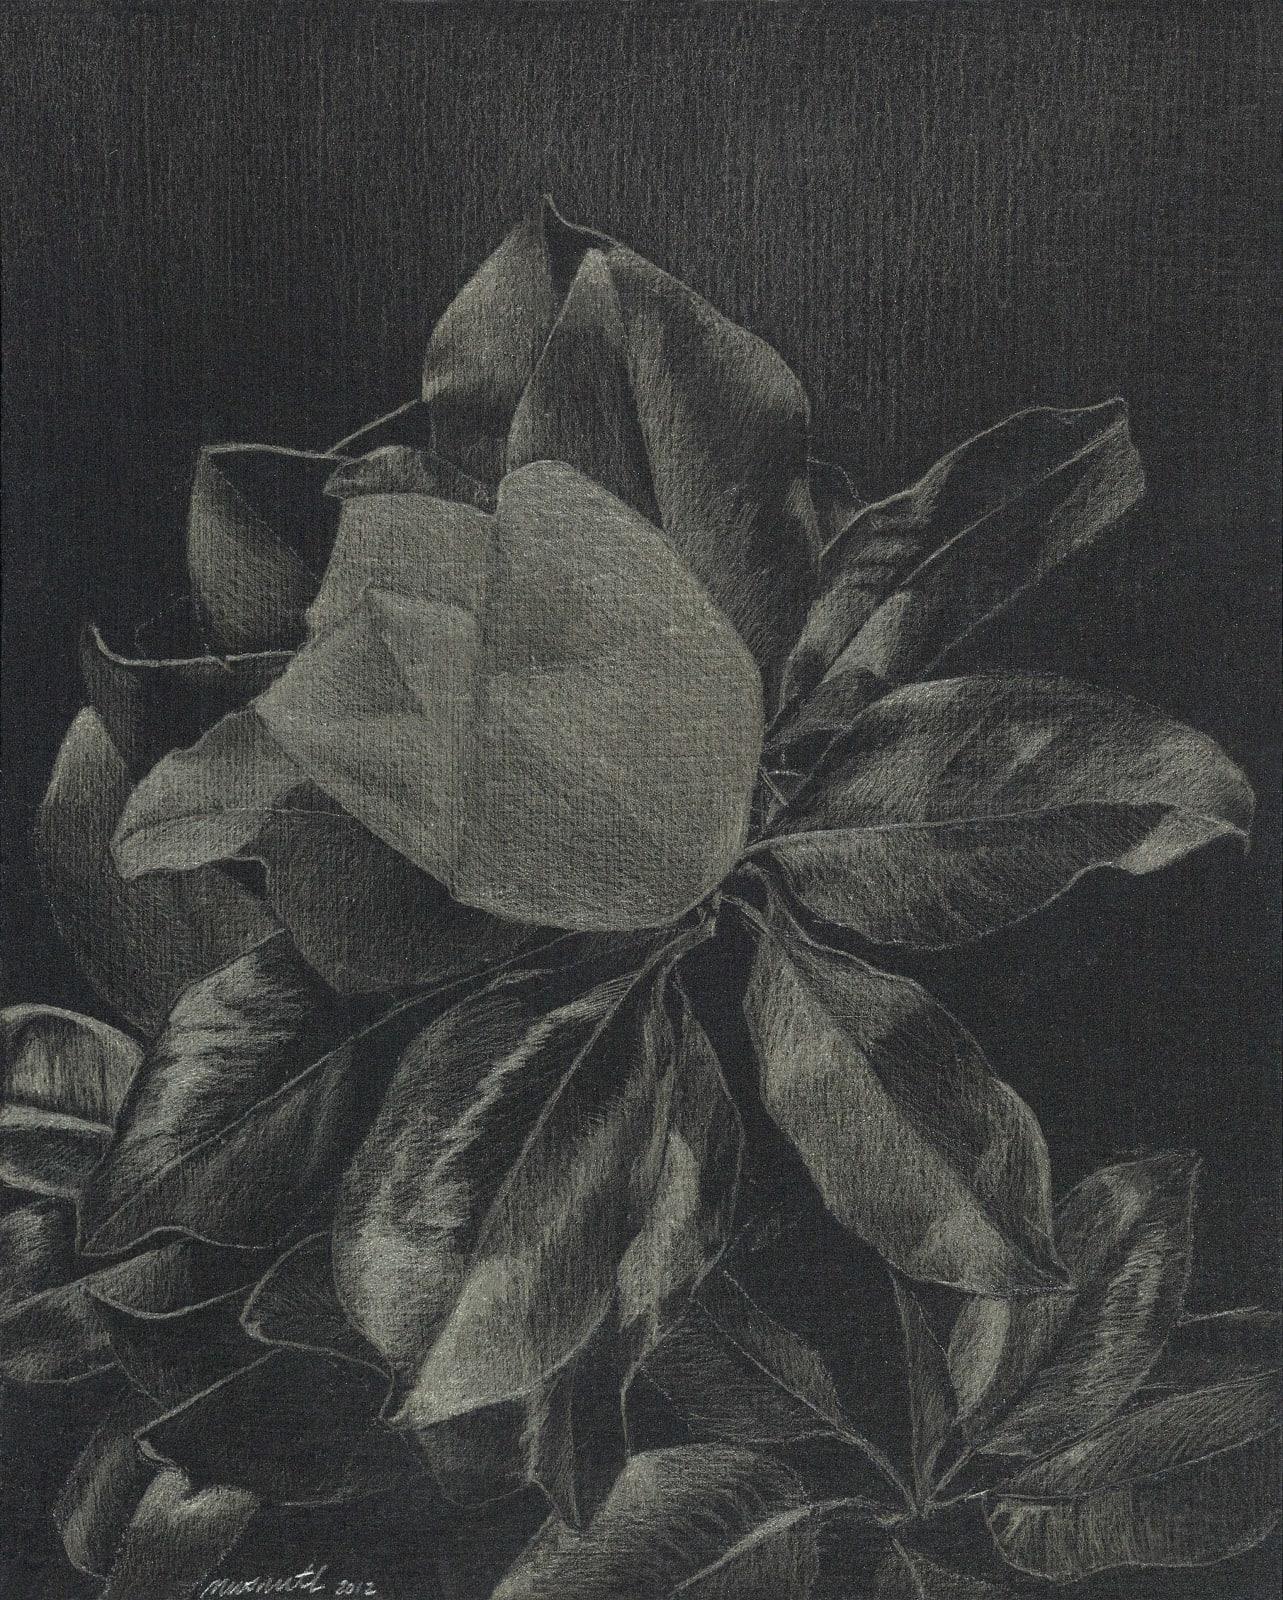 Marjorie Williams-Smith, Magnolia, 2012